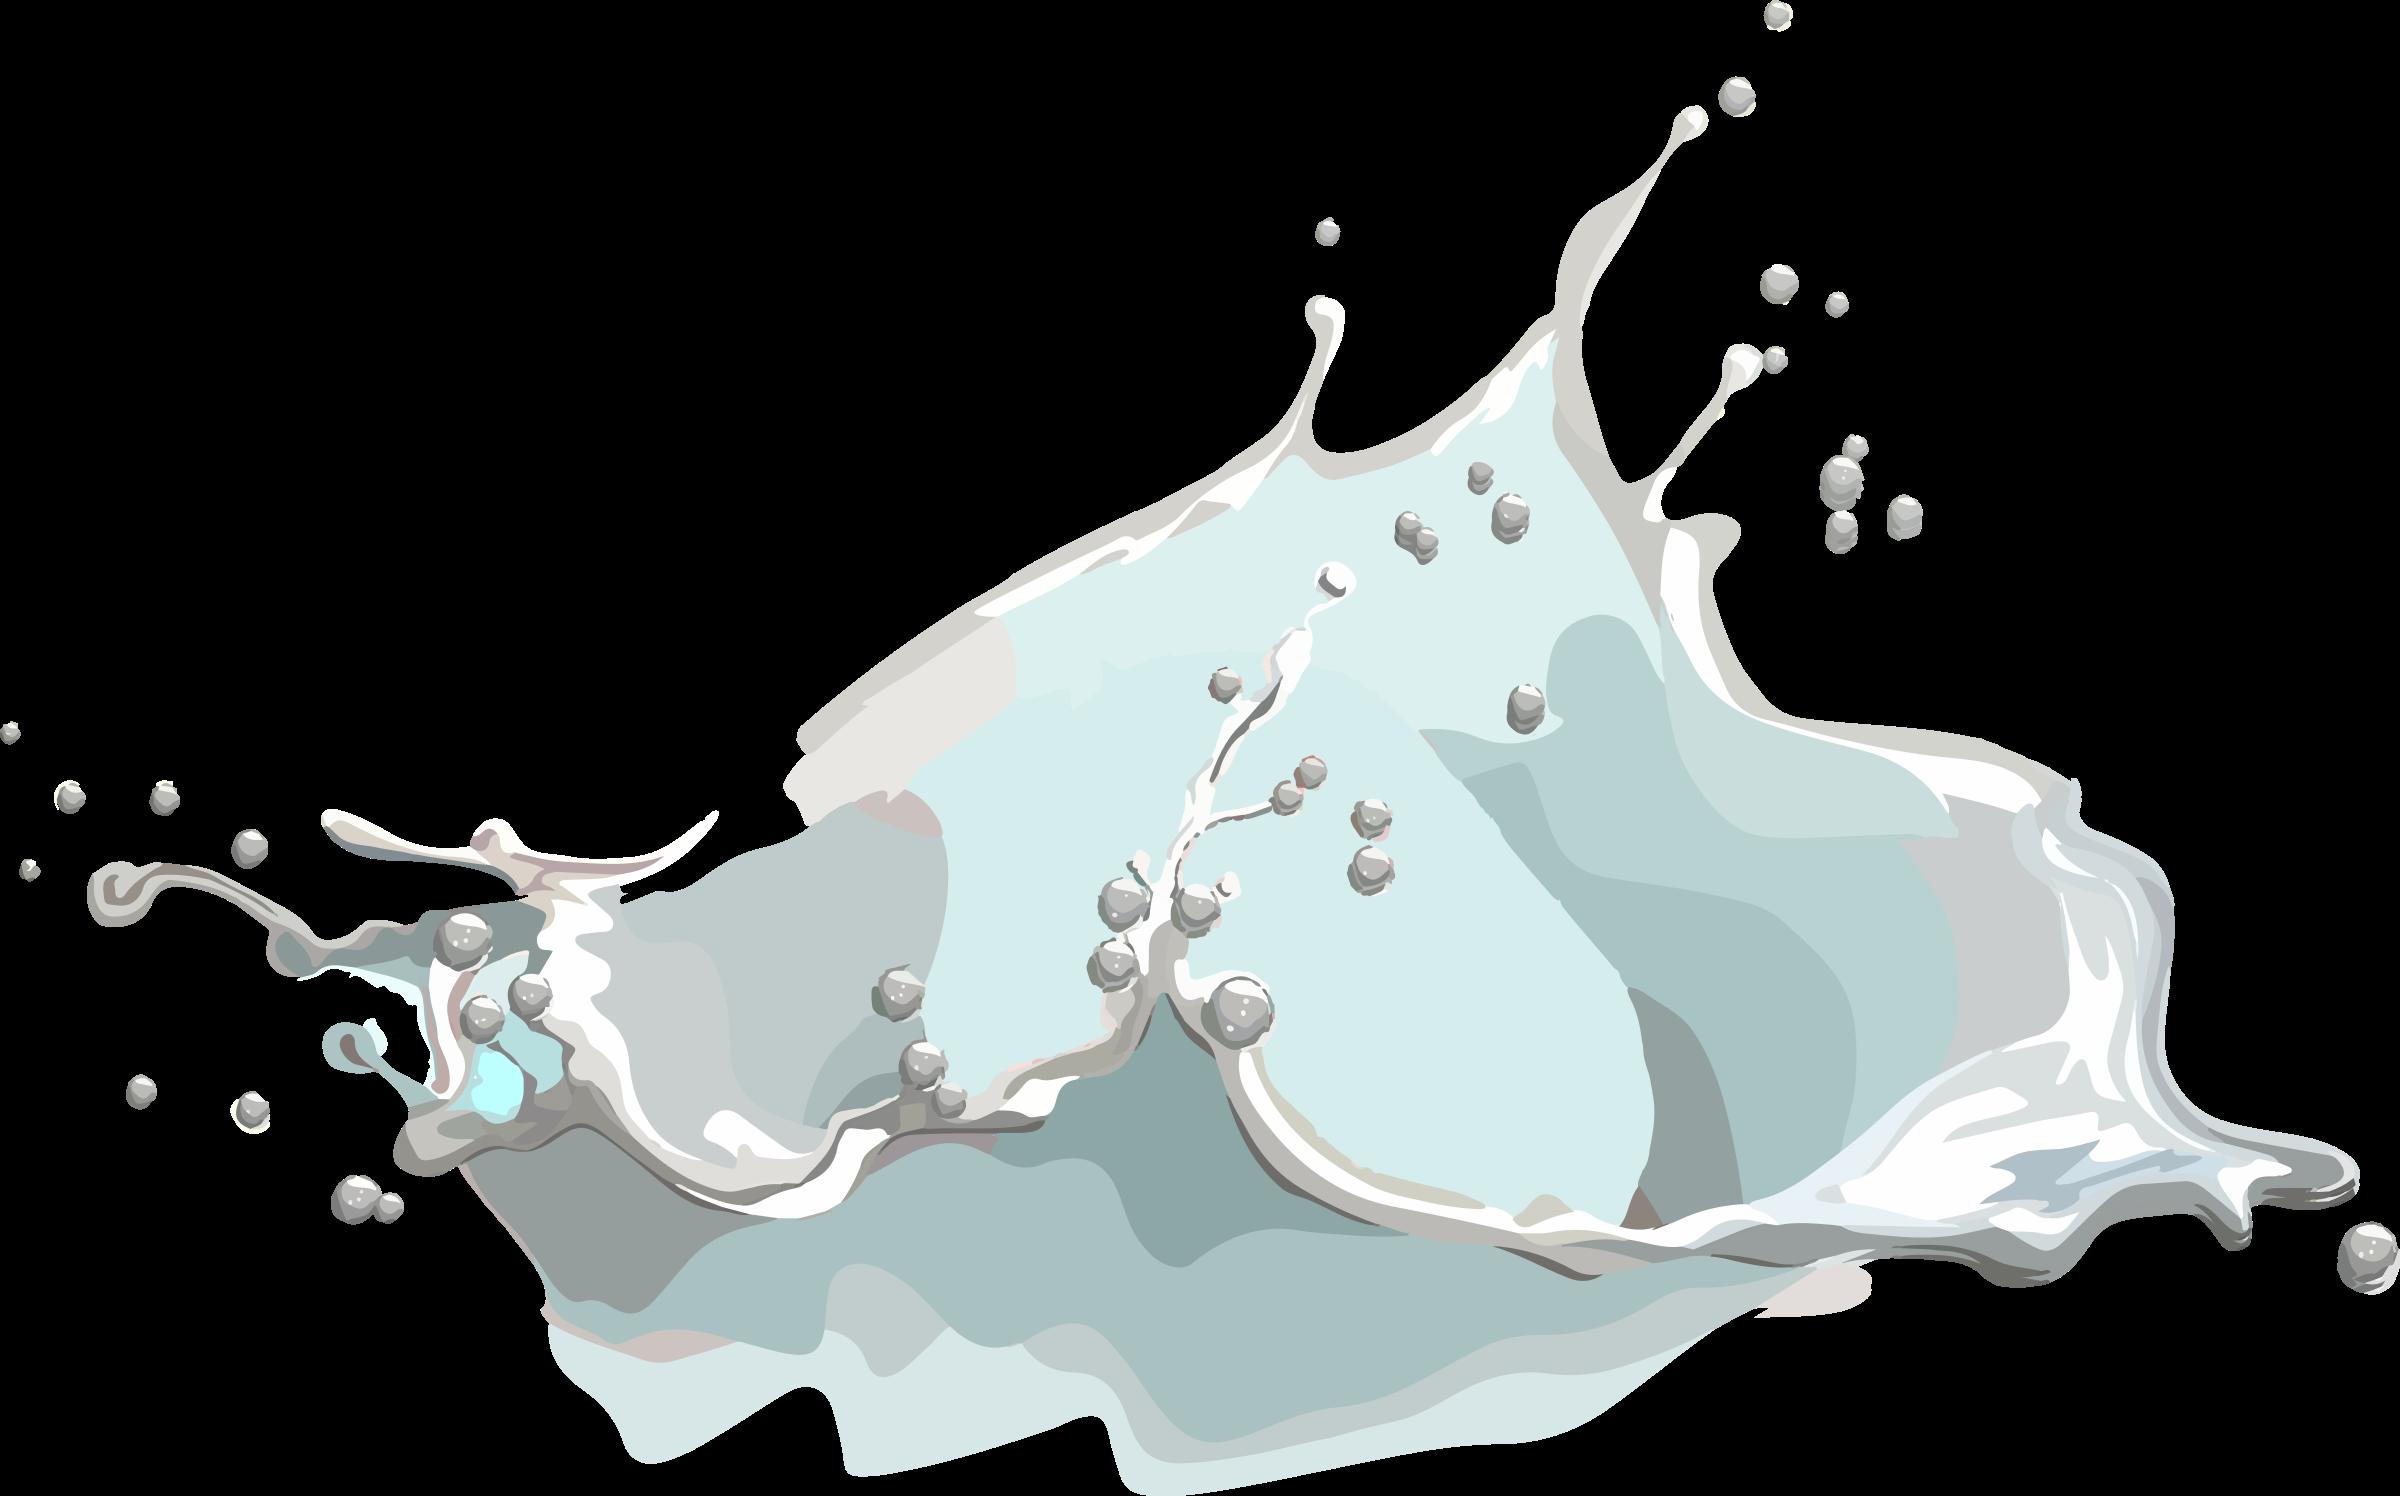 Water Splash Clipart Png Clipart - Water Splash